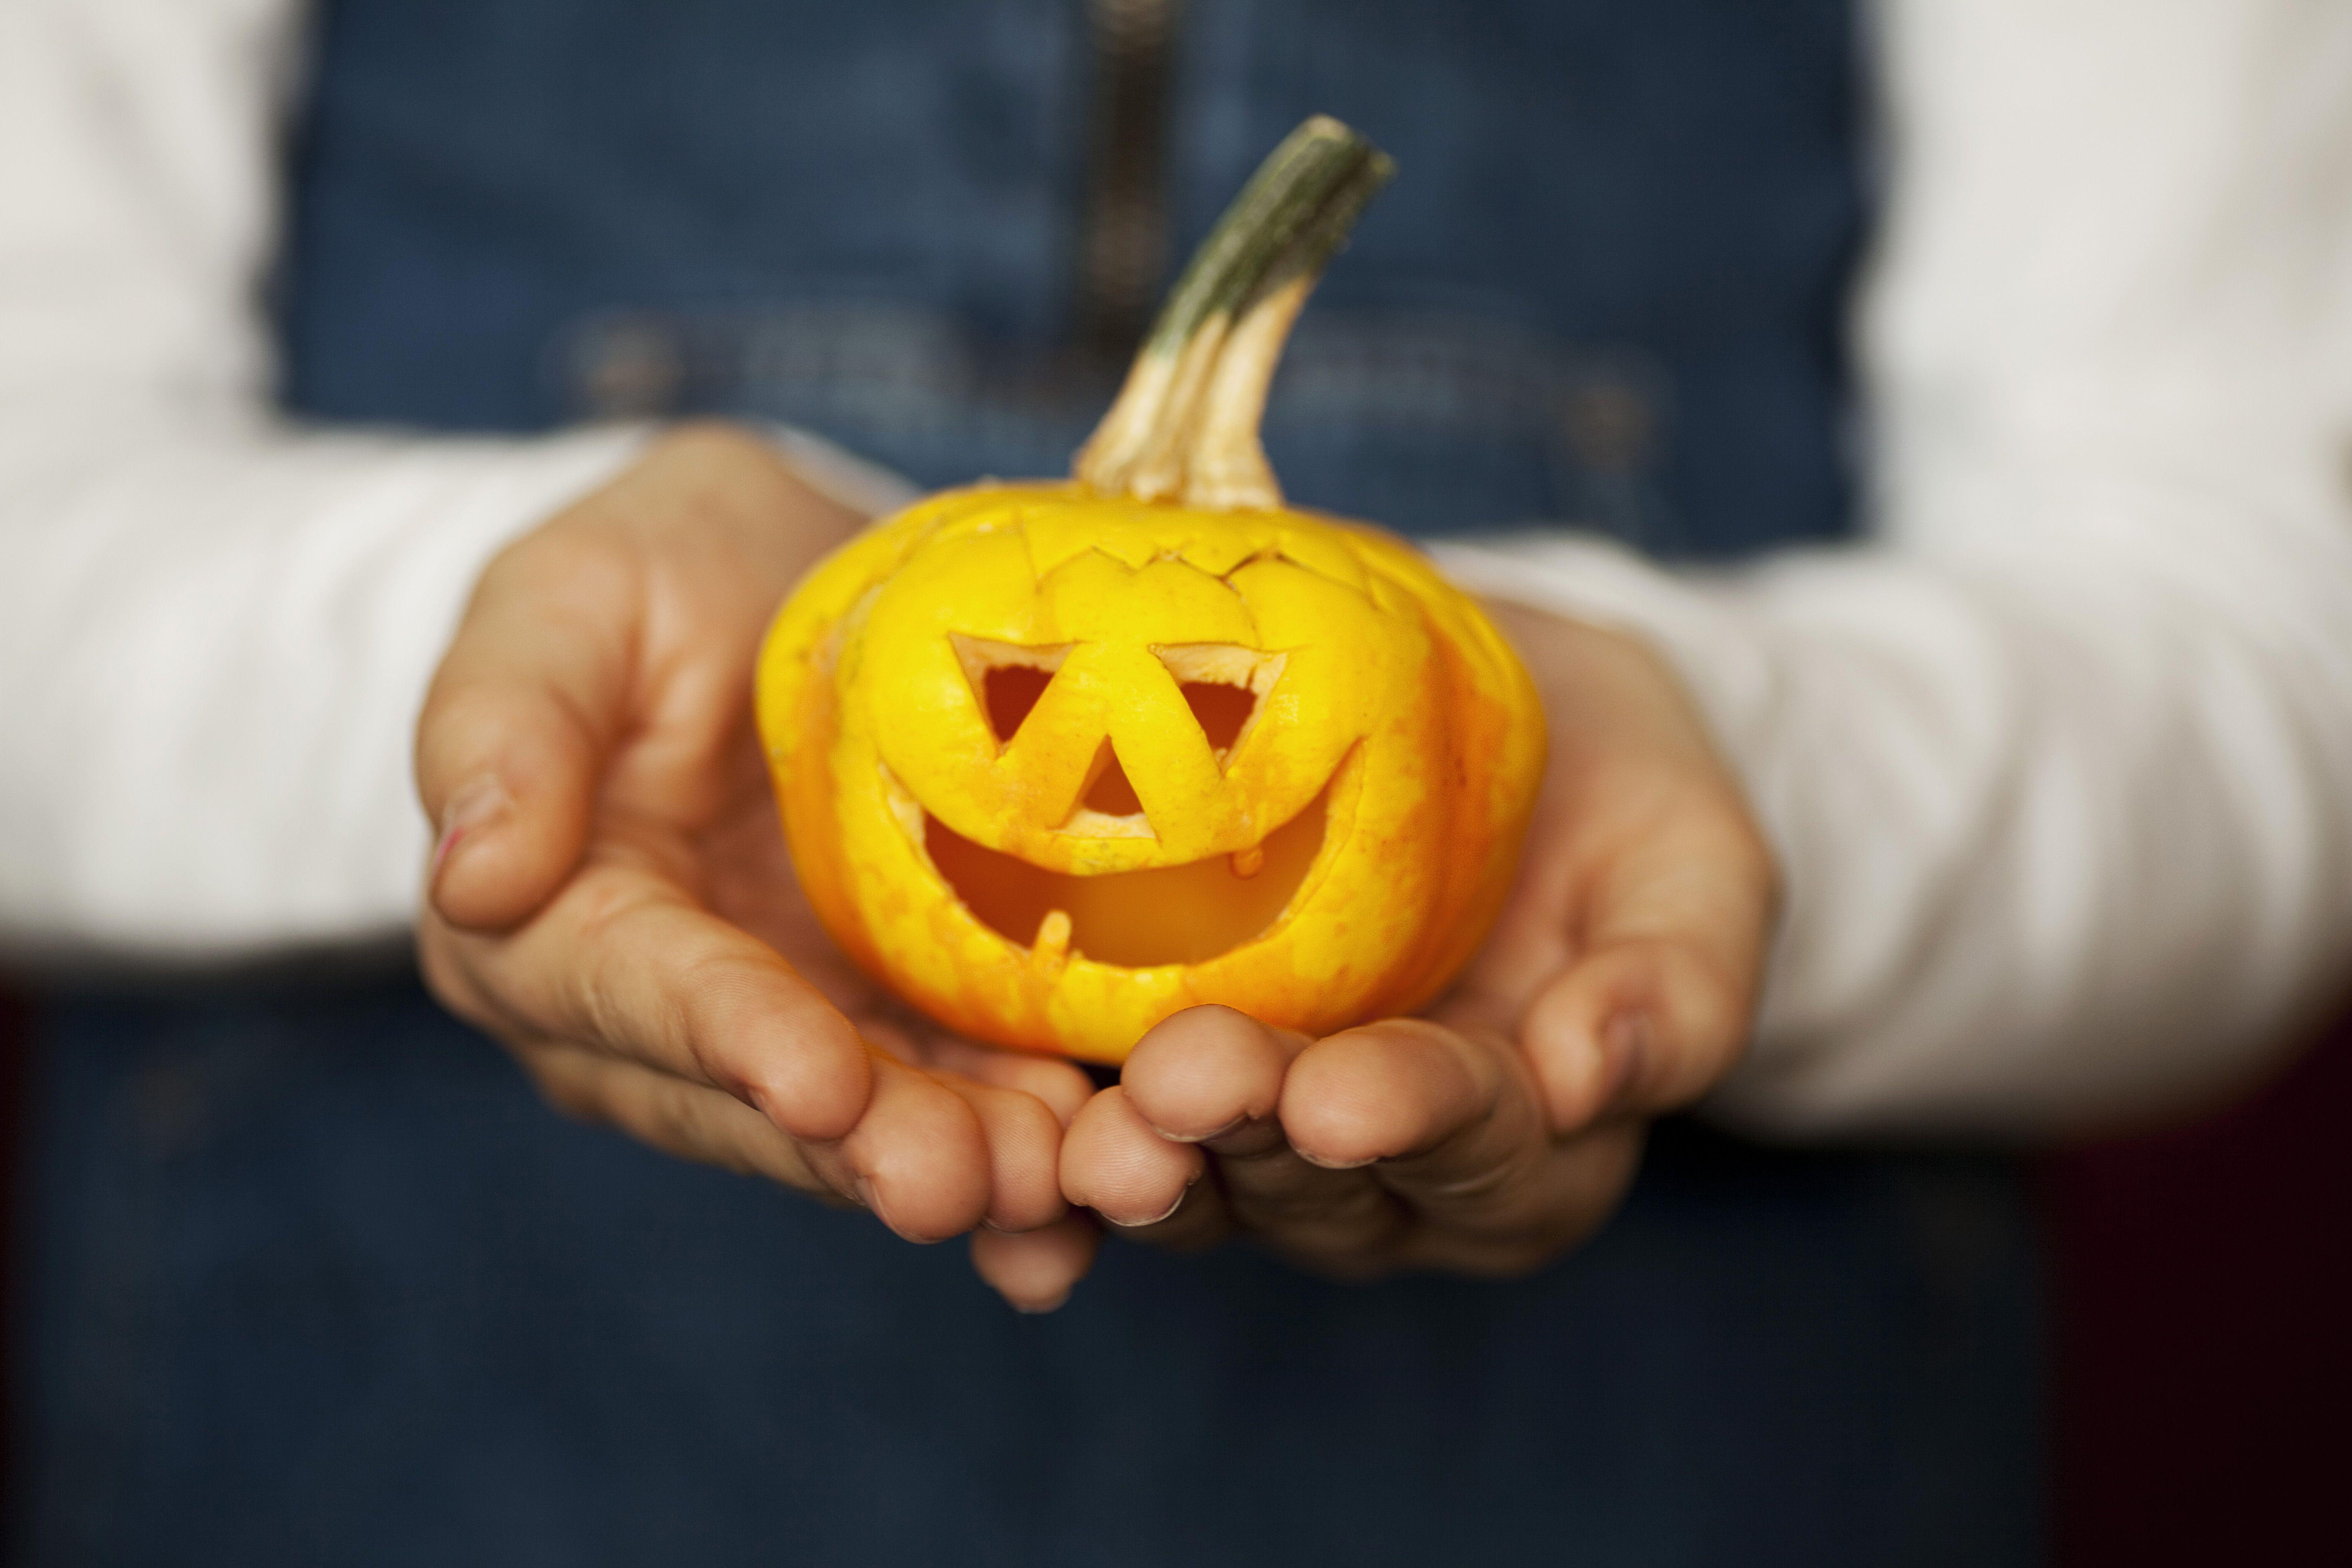 Hands holding a carved pumpkin